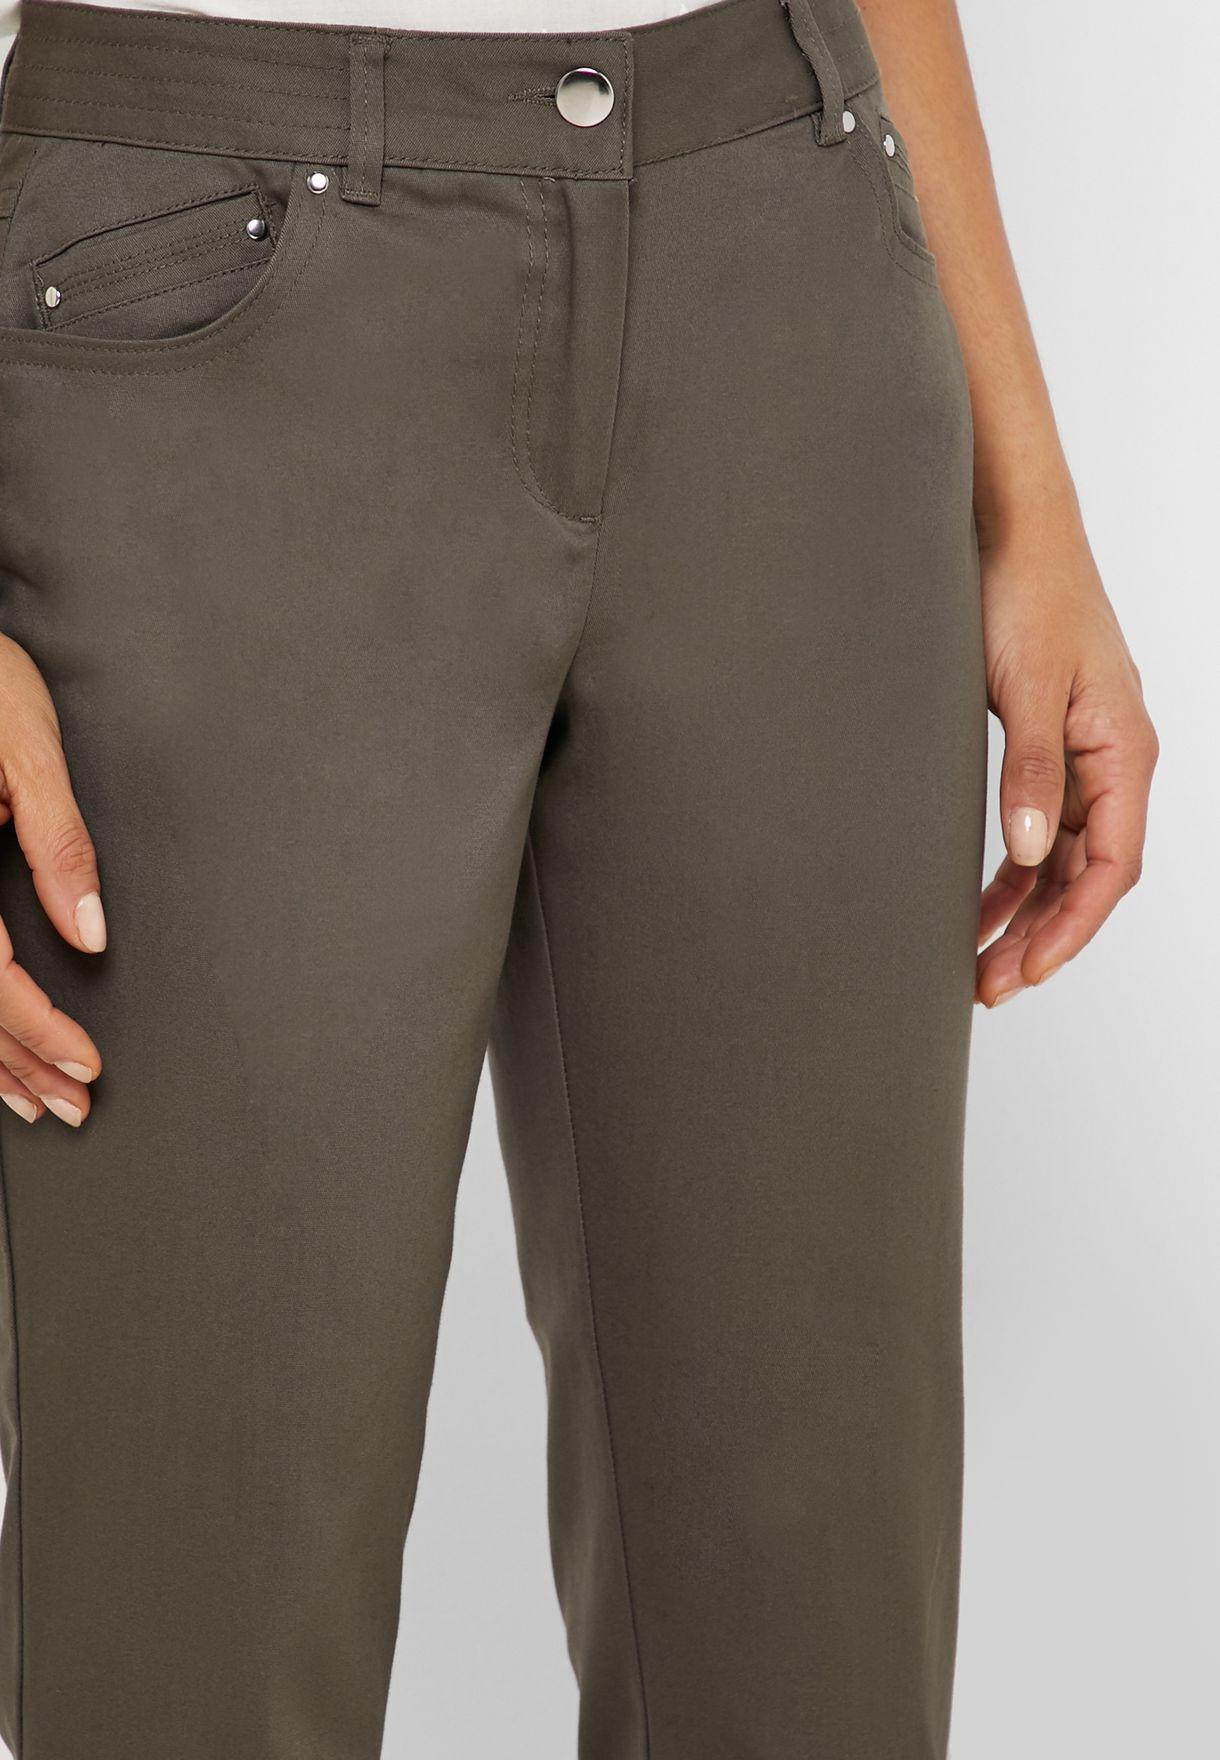 Straight Crop Pants